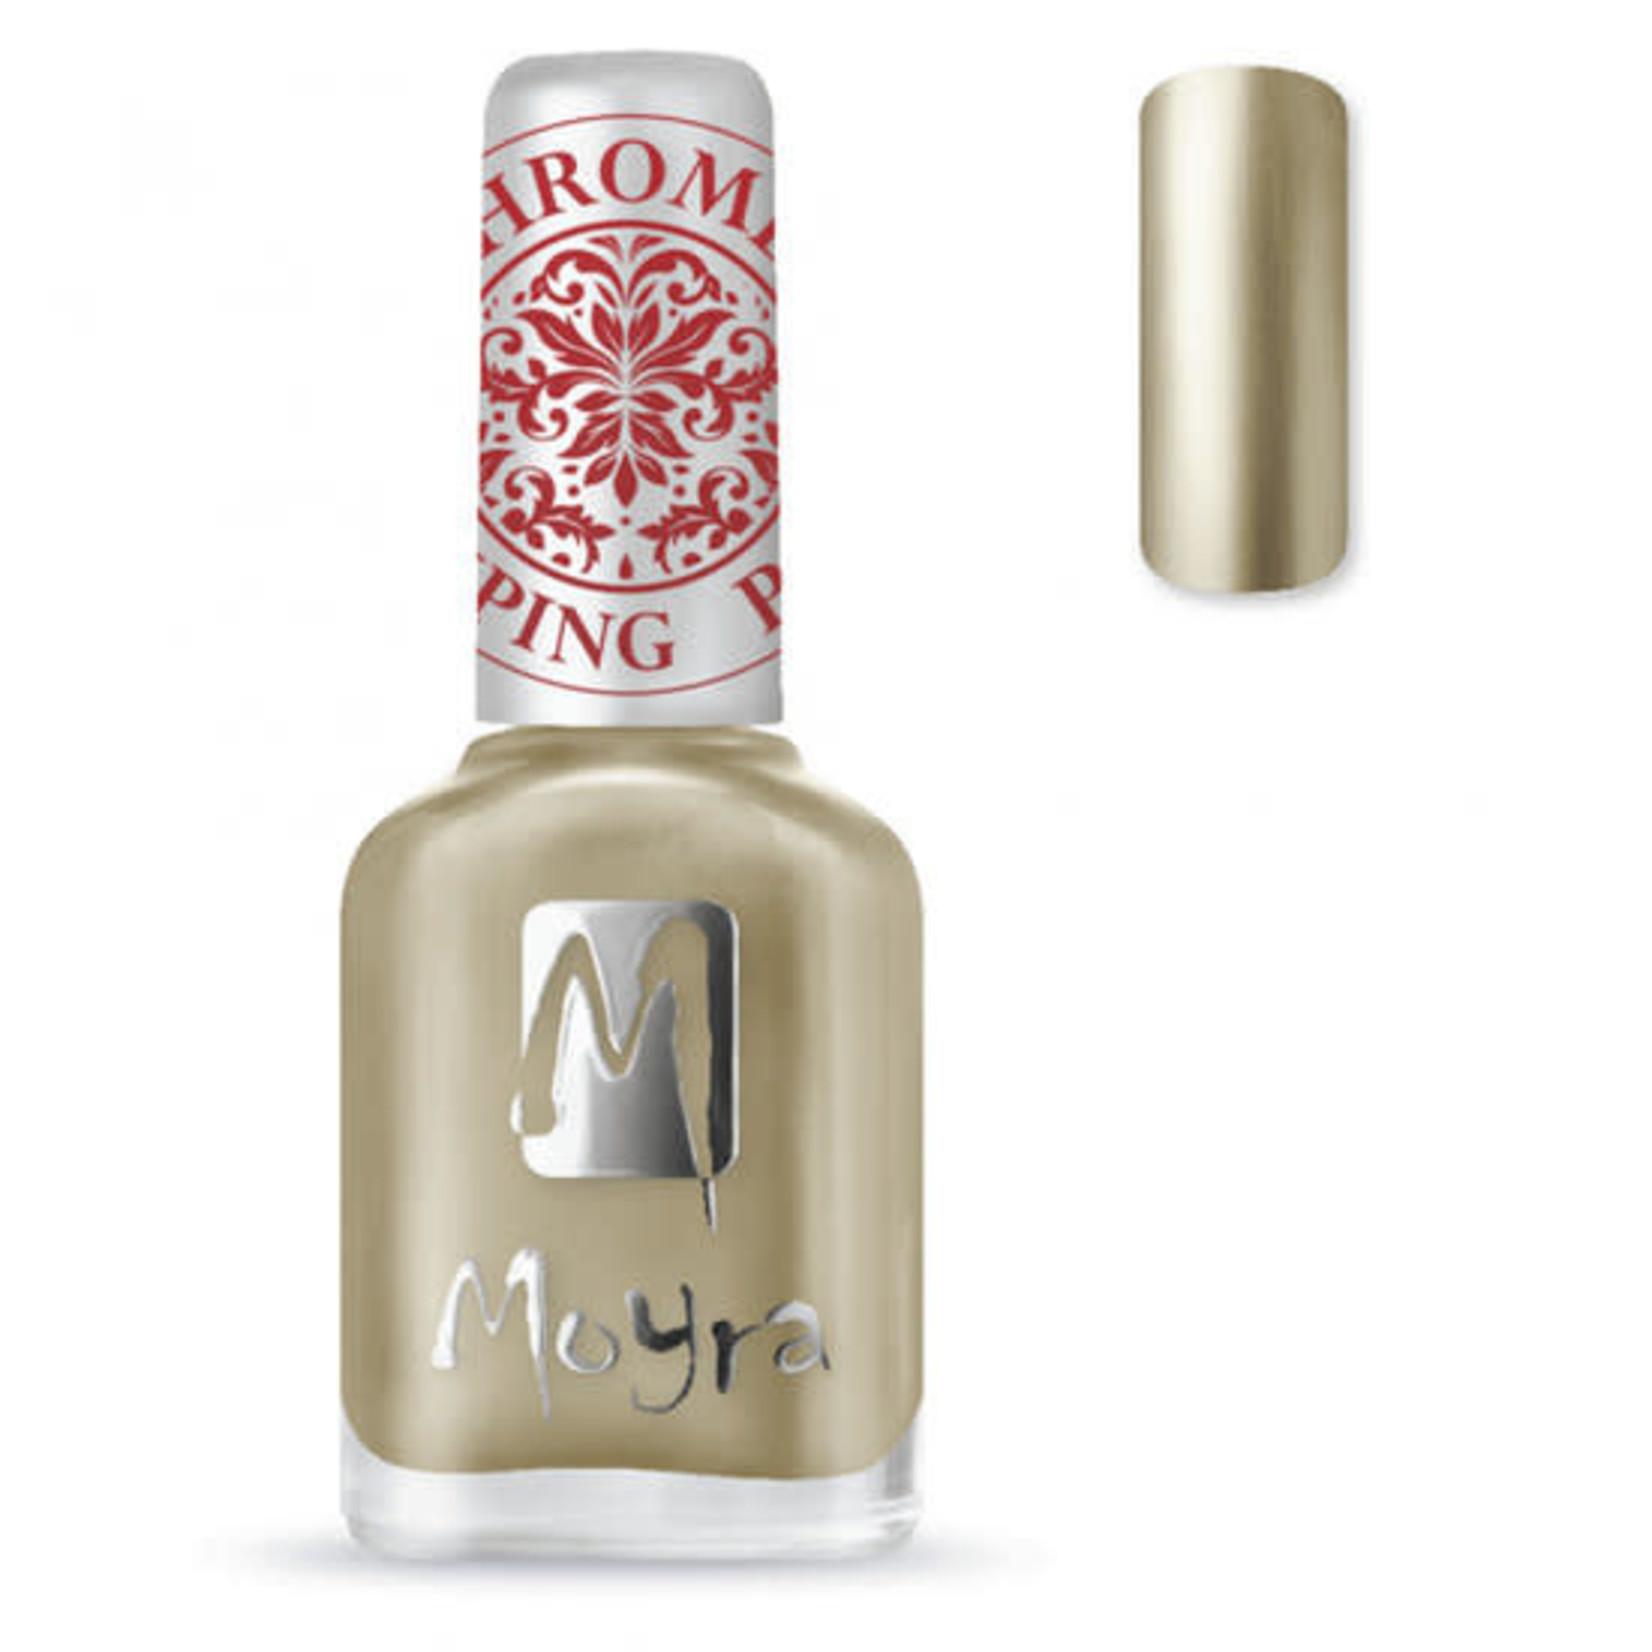 Moyra Moyra Stamping nail polish SP24 Chrome Gold